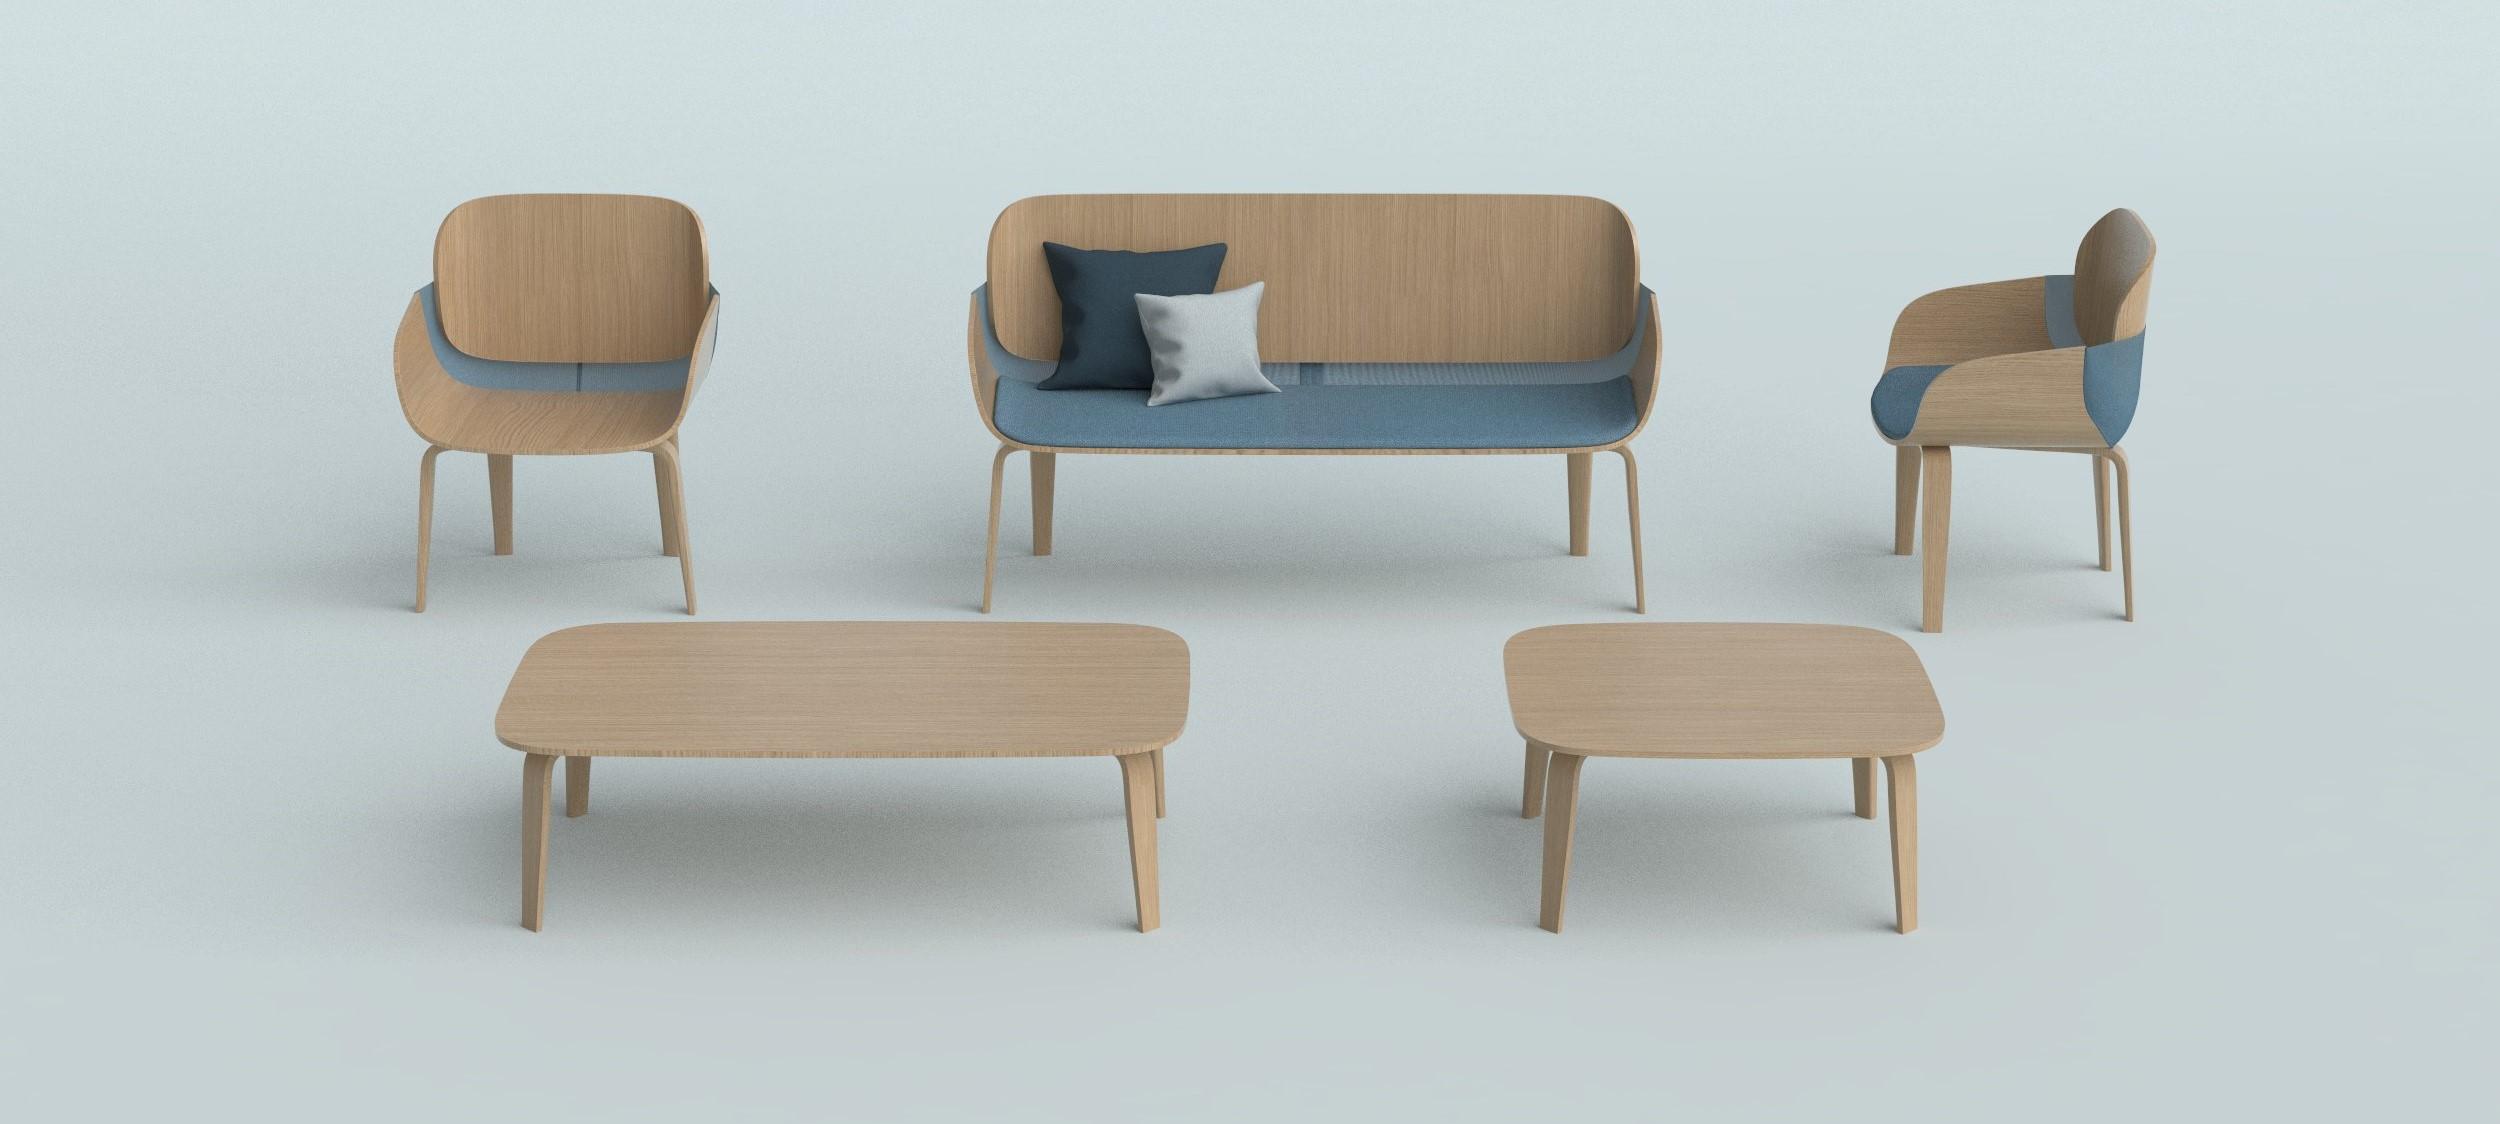 diseño mobiliario madera mesa banco silla